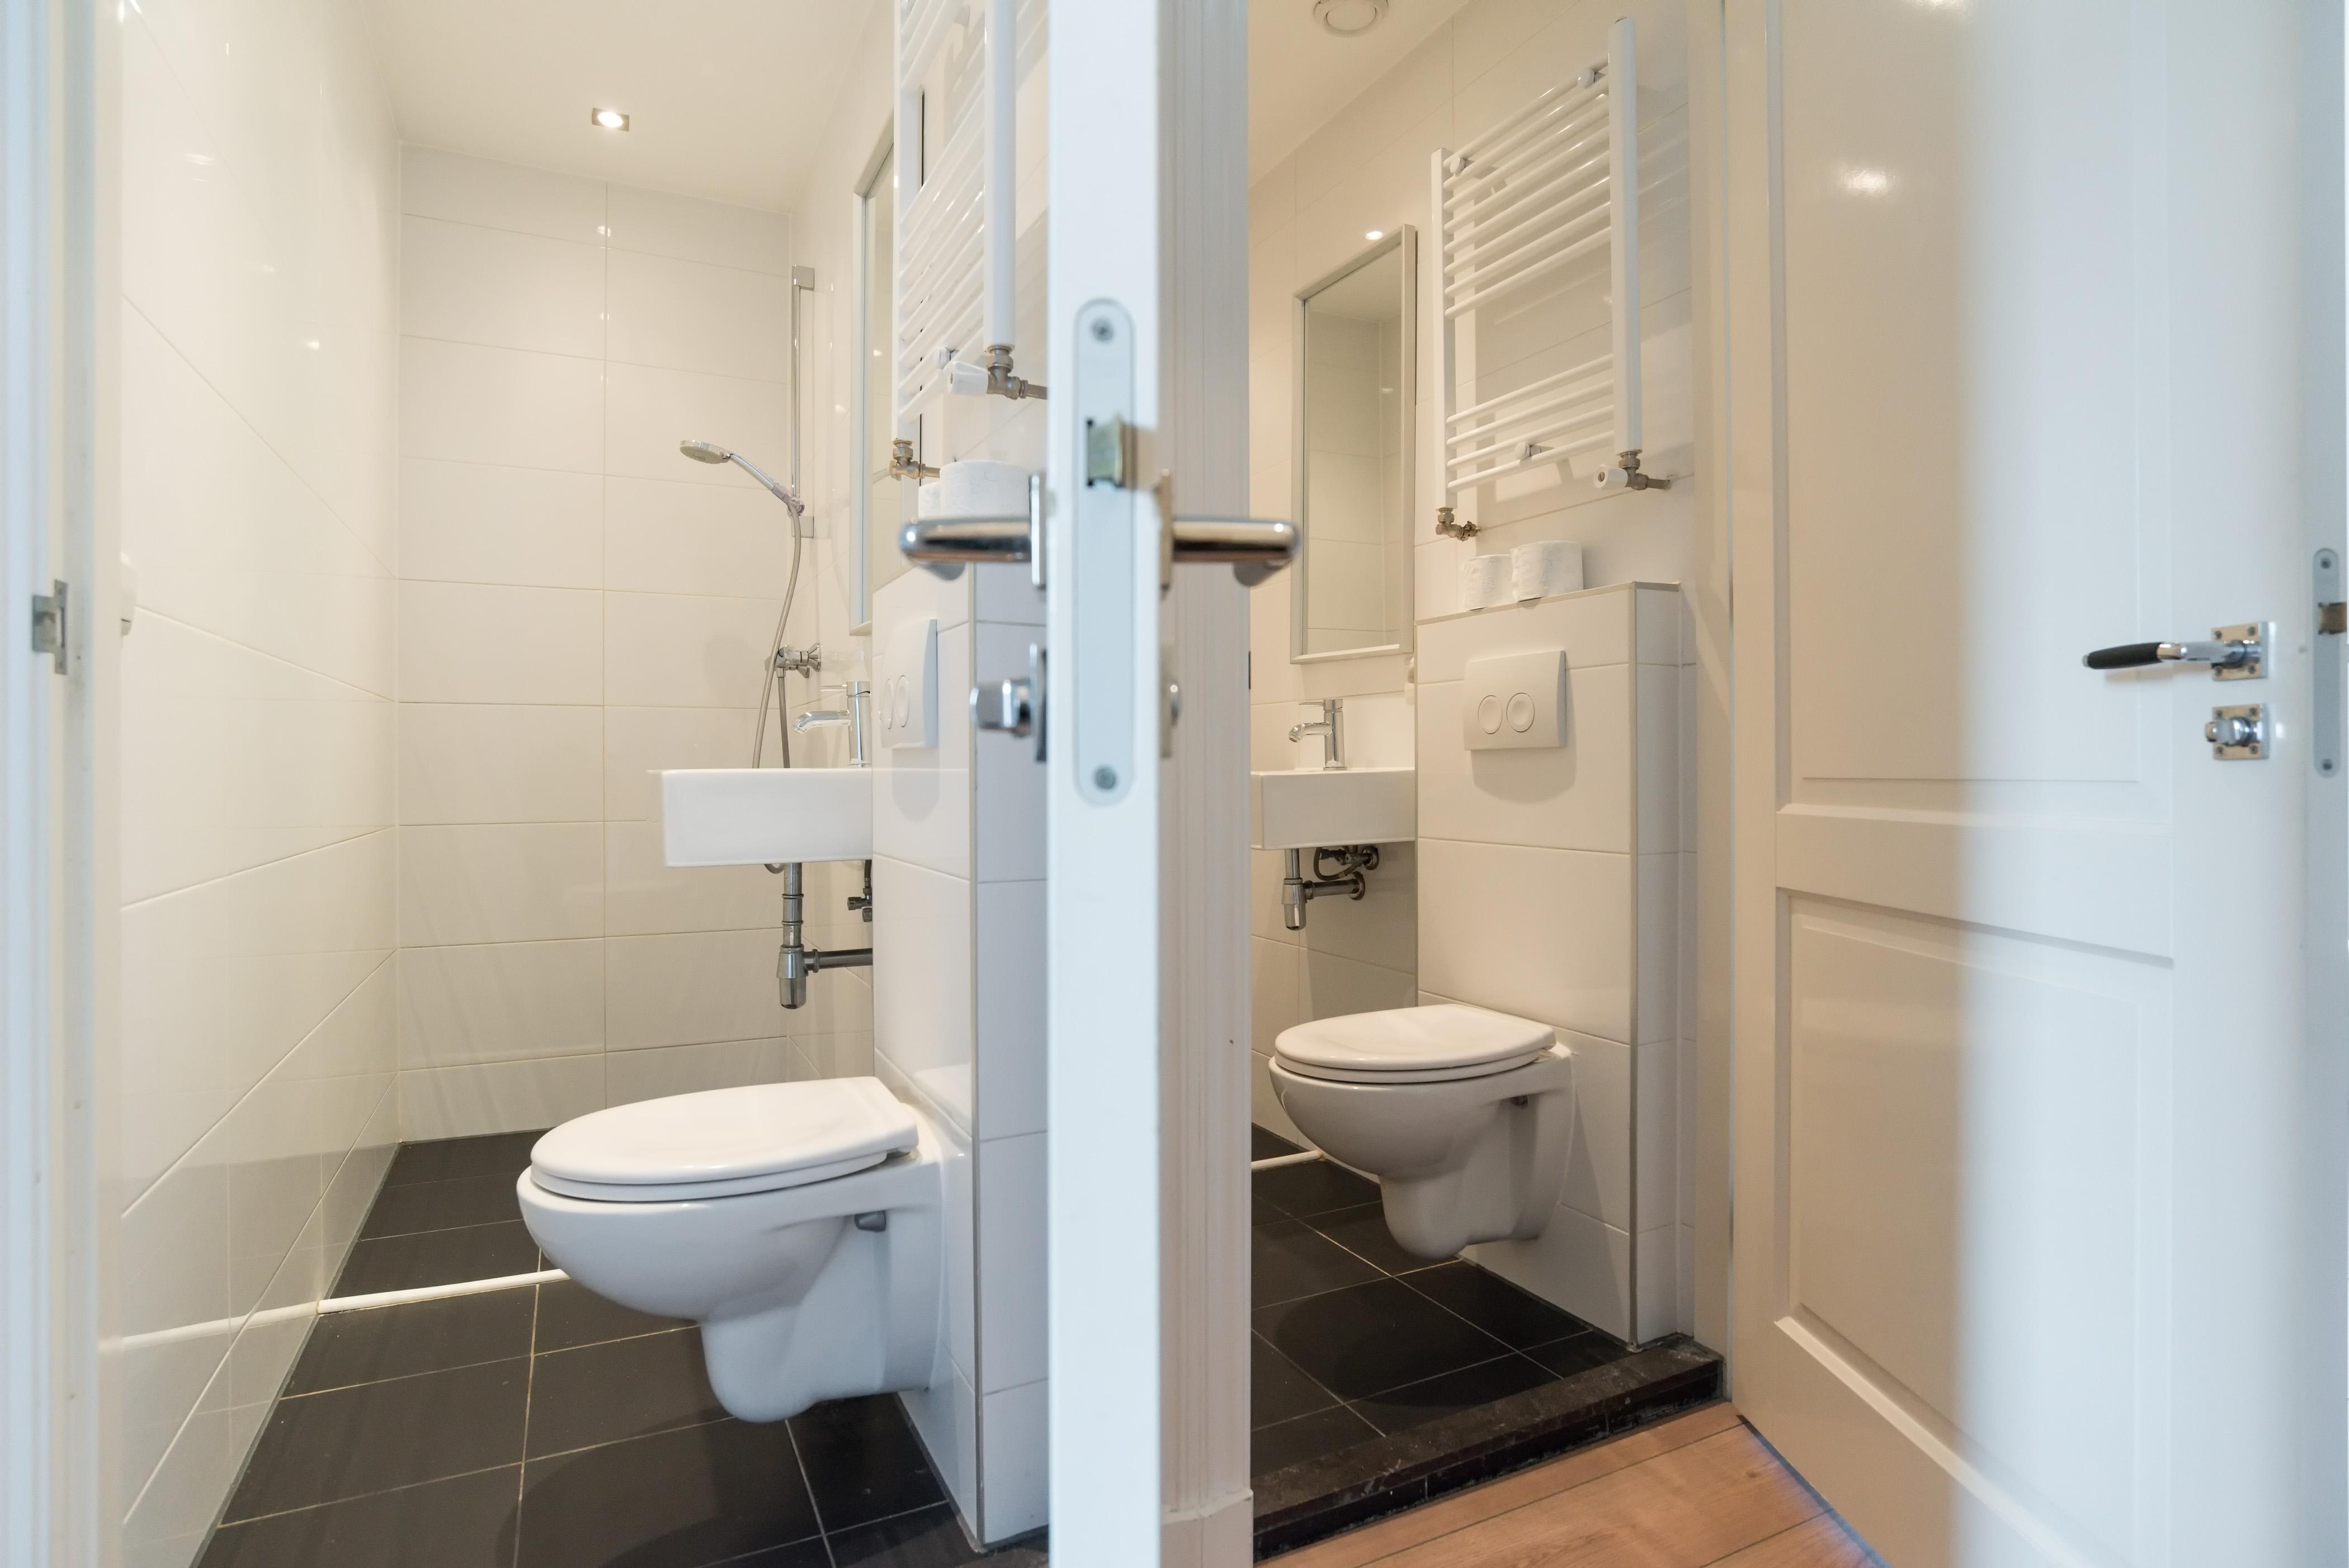 Apartment Amsterdam Apartments Souterain photo 20450628